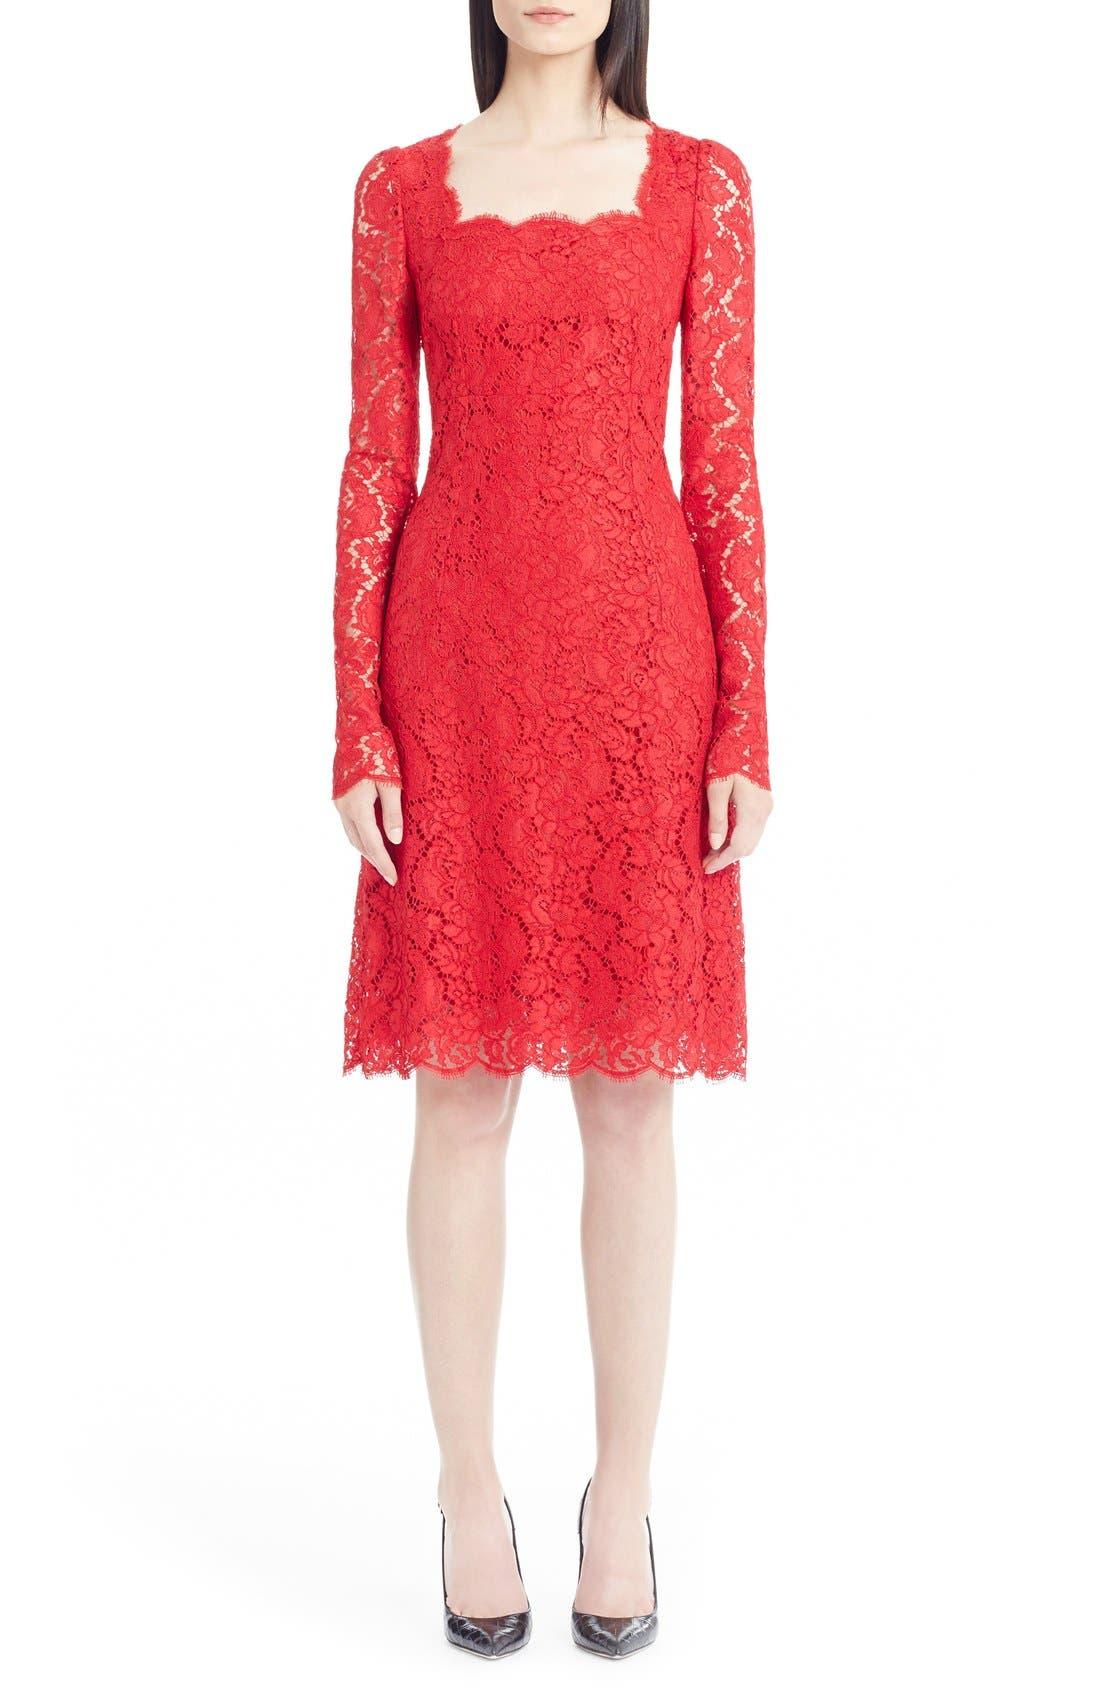 Main Image - Dolce&Gabbana Square Neck Lace Dress